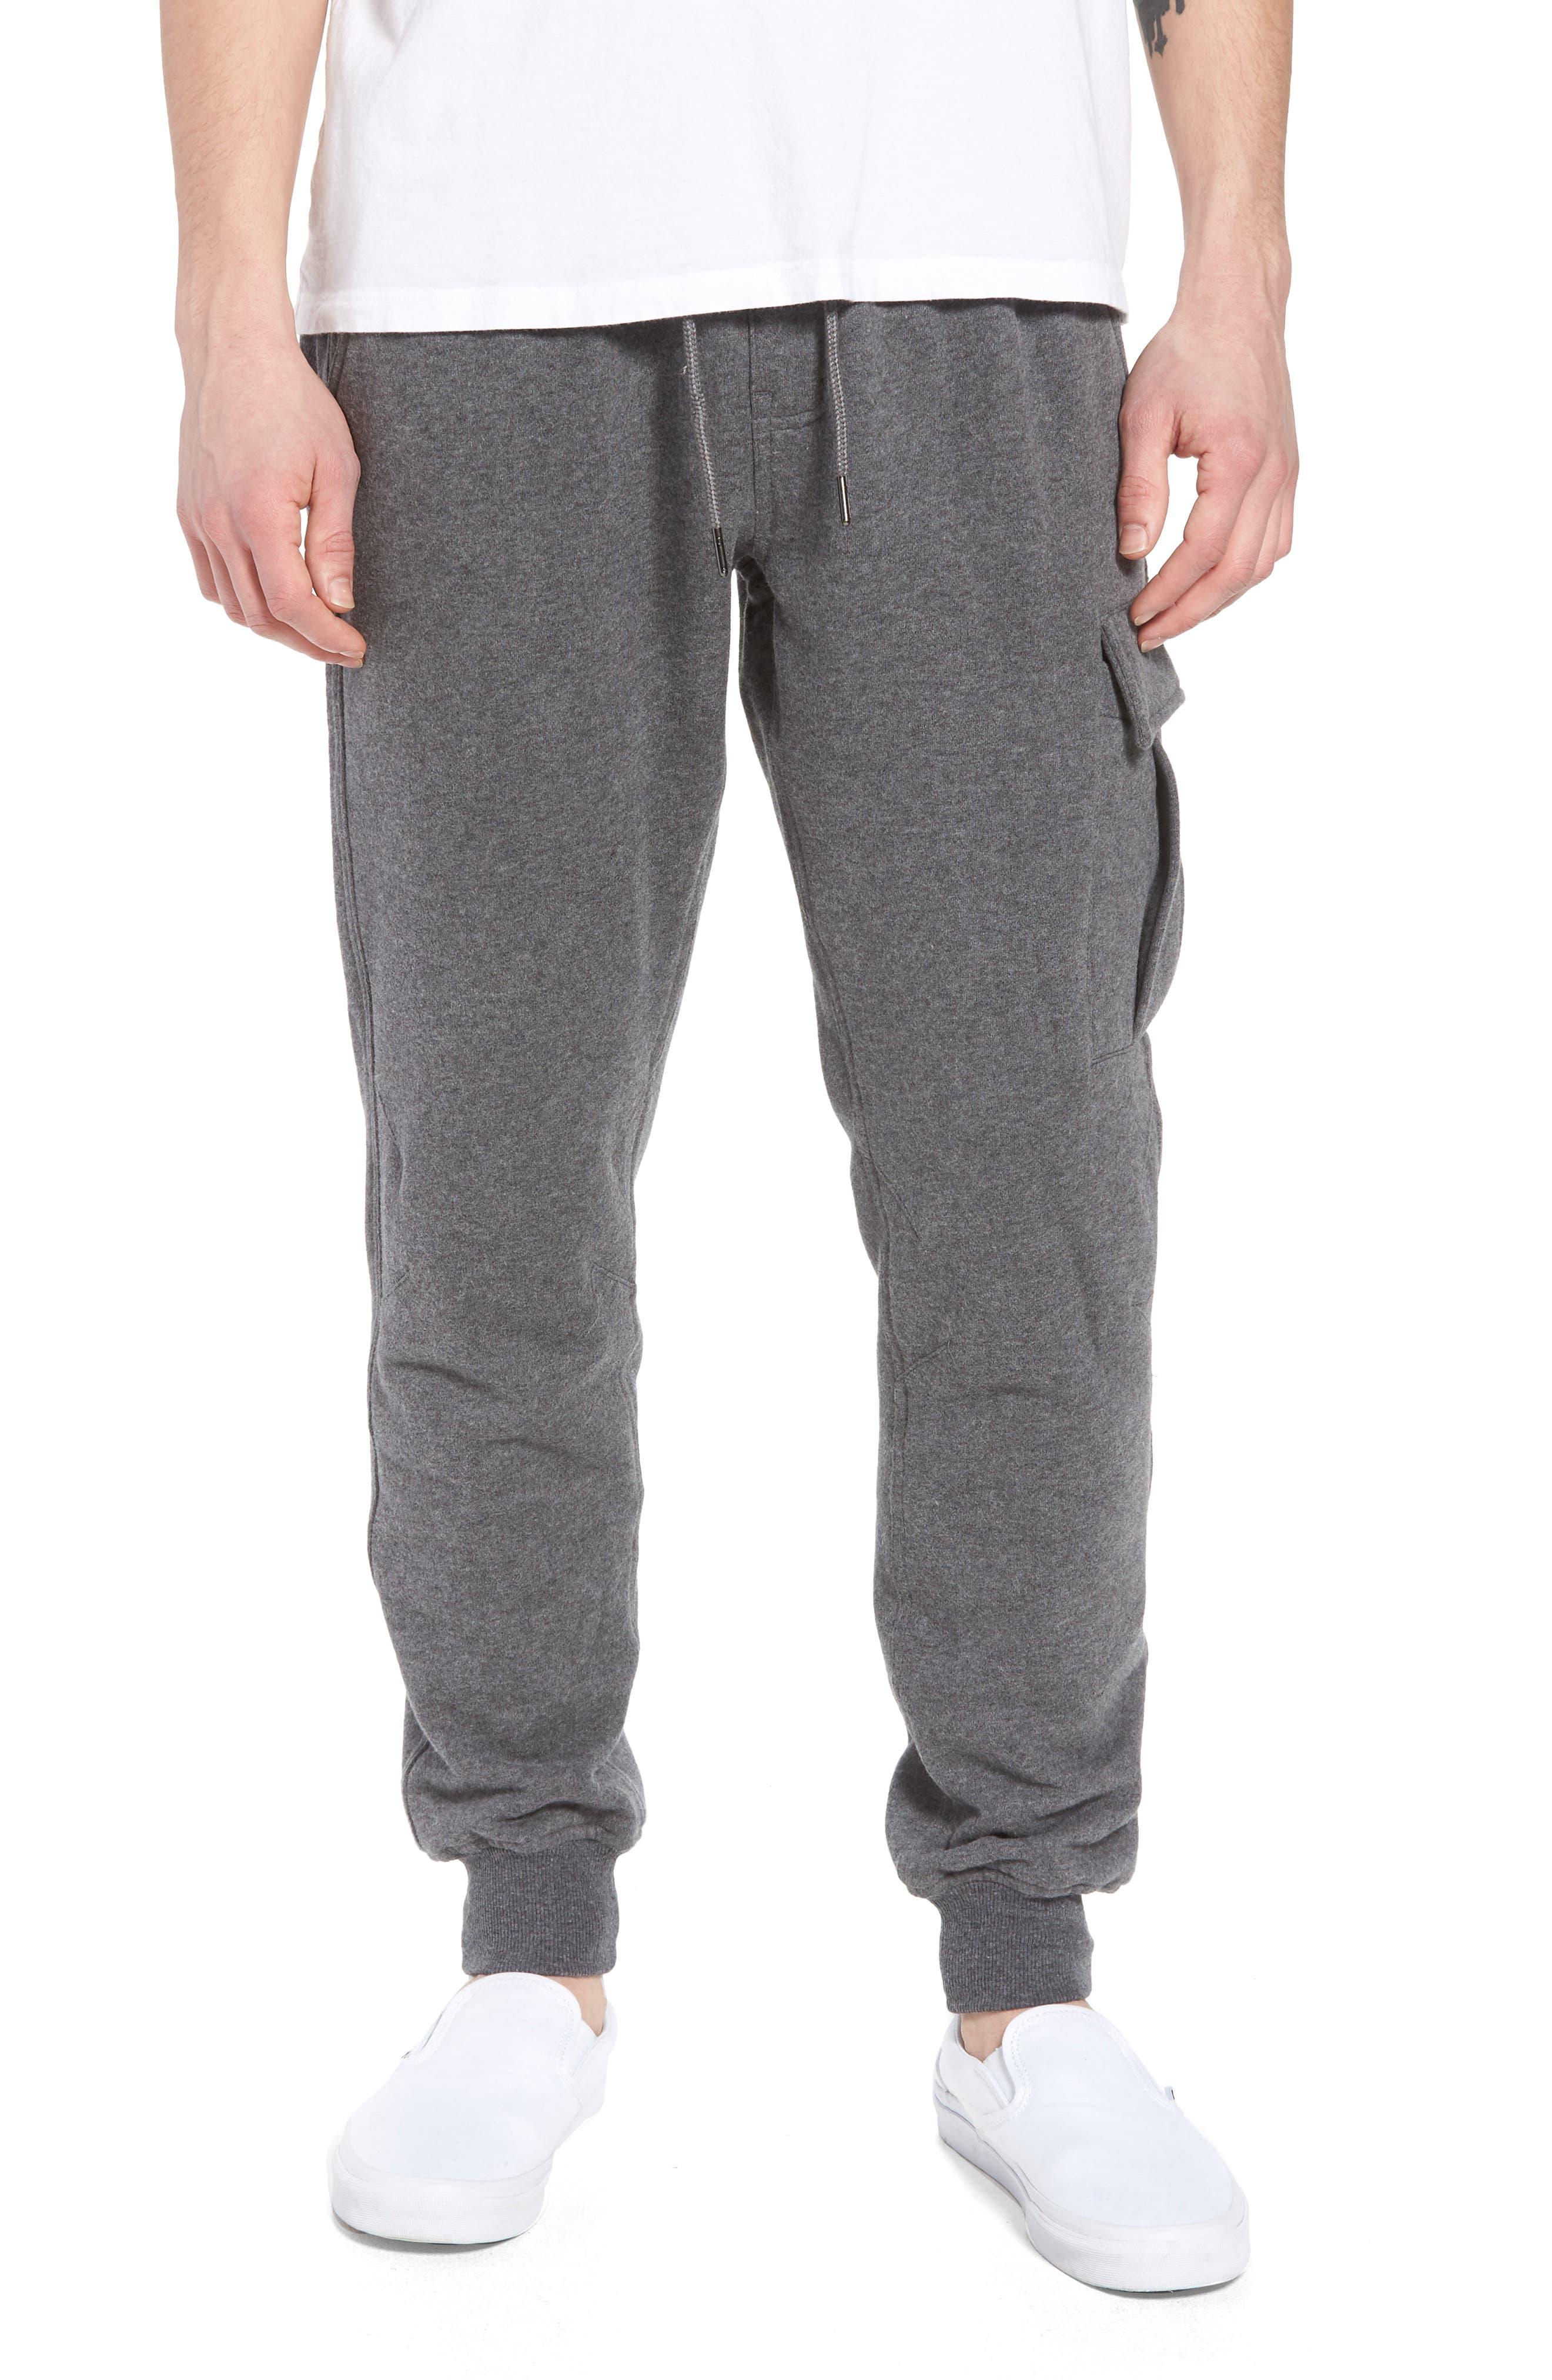 Mayers Jogger Pants 3,                         Main,                         color, 020